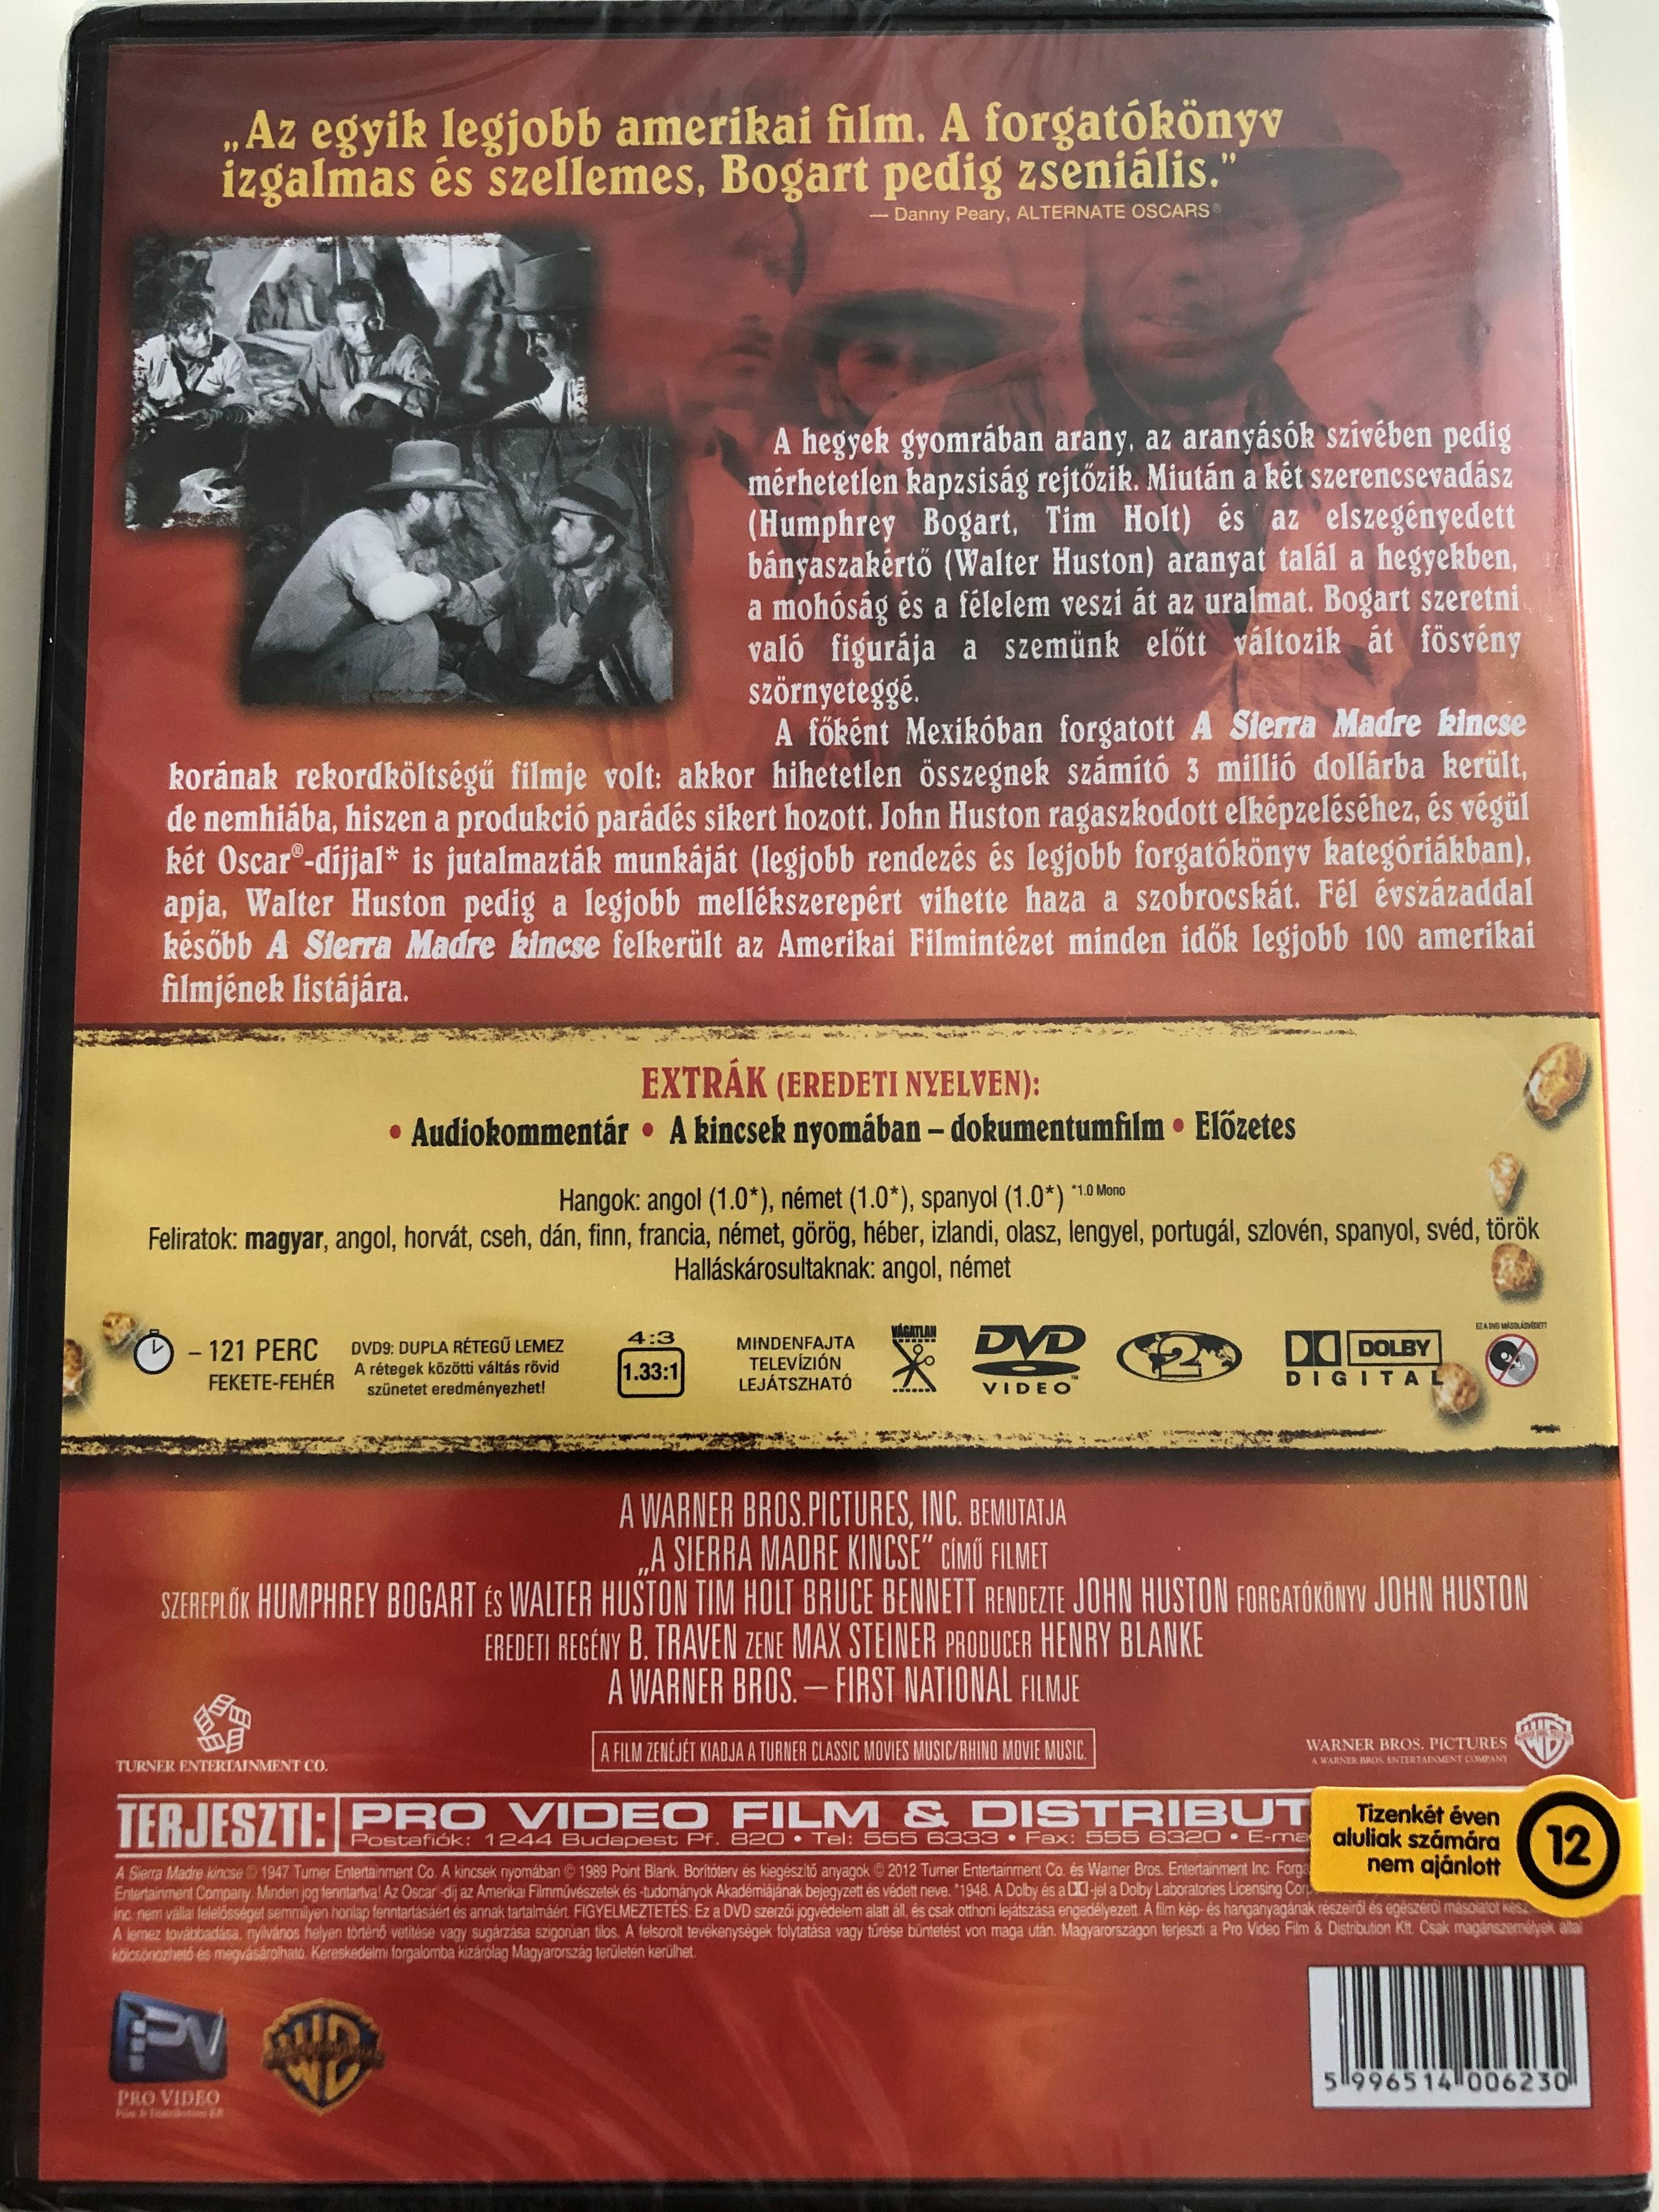 thre-treasure-of-the-sierra-madre-dvd-1947-a-sierra-madre-kincse-directed-by-john-huston-starring-humphrey-bogart-walter-huston-tim-holt-bruce-bennett-bogart-classic-2-.jpg